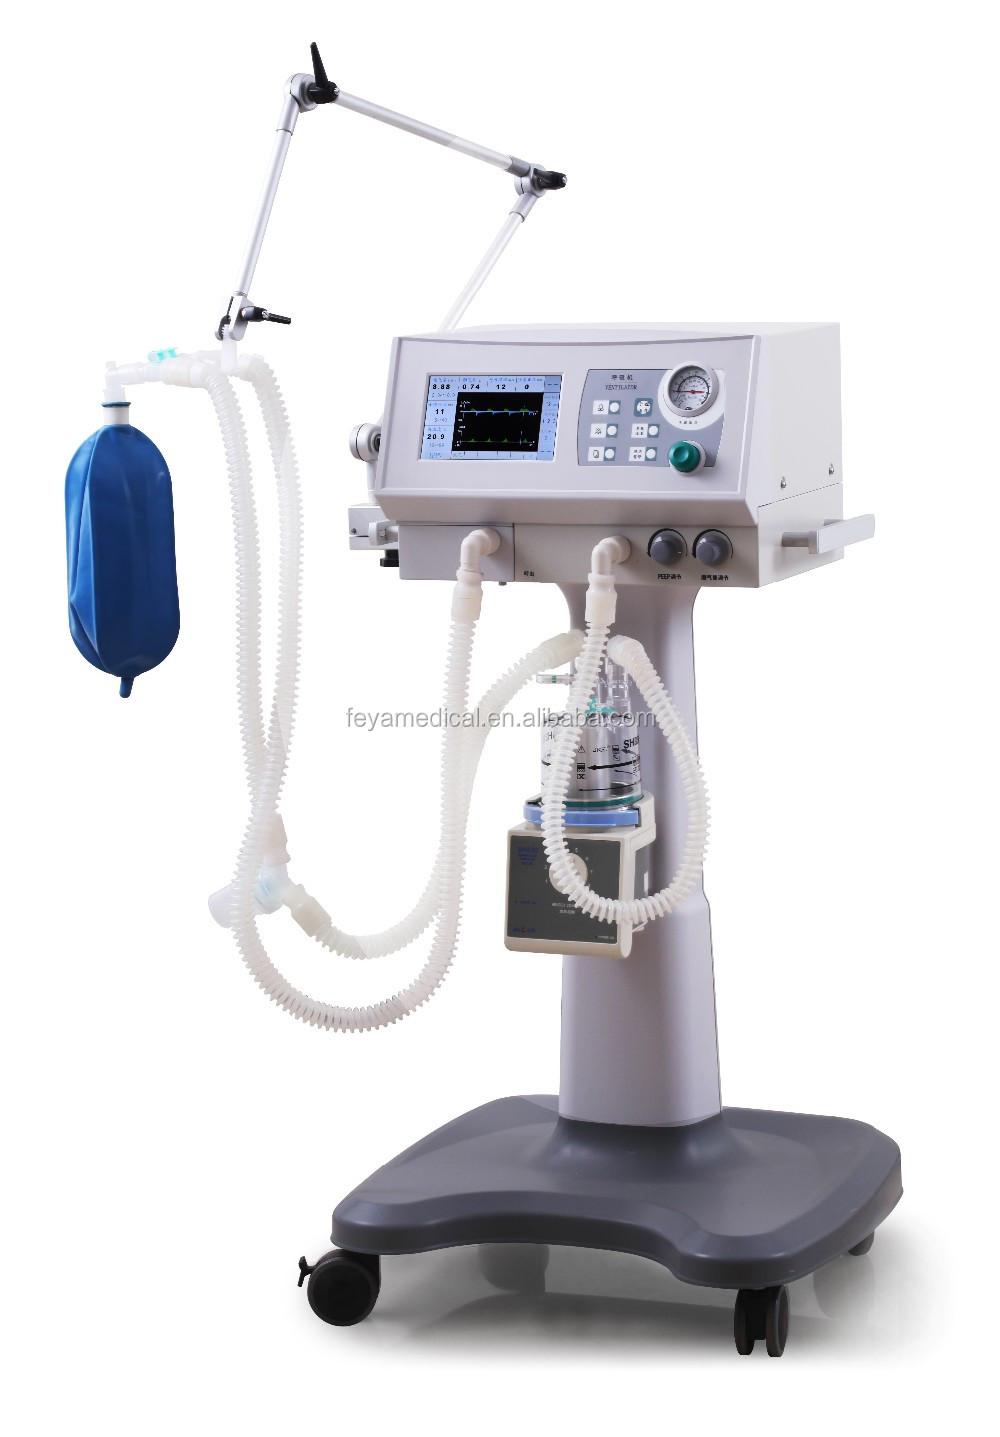 High flow oxygen therapy with Hamilton Medical ventilators ...  |Ventilator